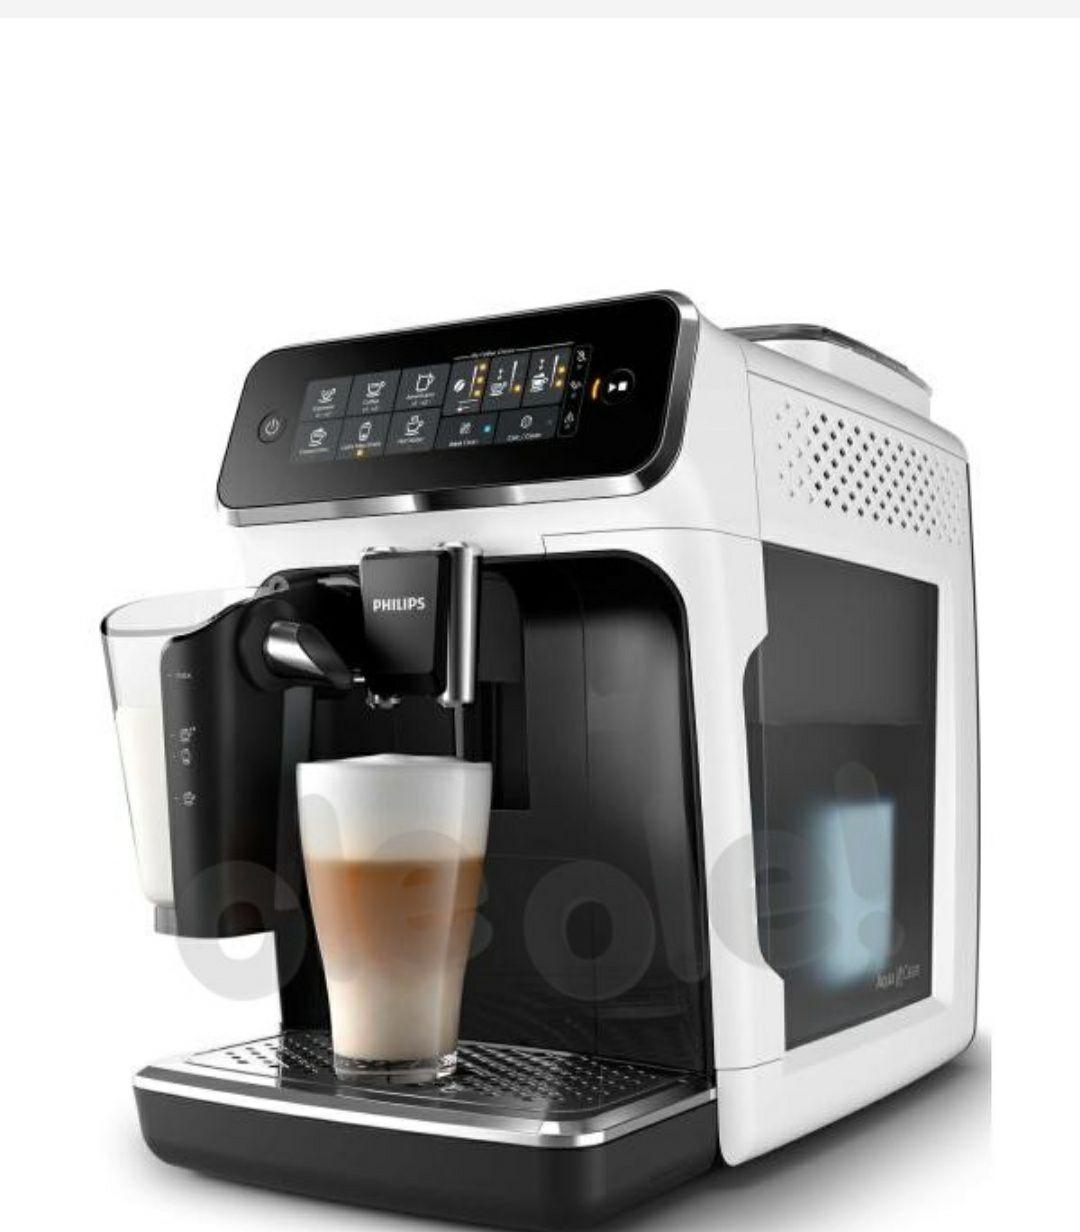 Philips LatteGo Premium EP3243/50 ekspres ciśnieniowy